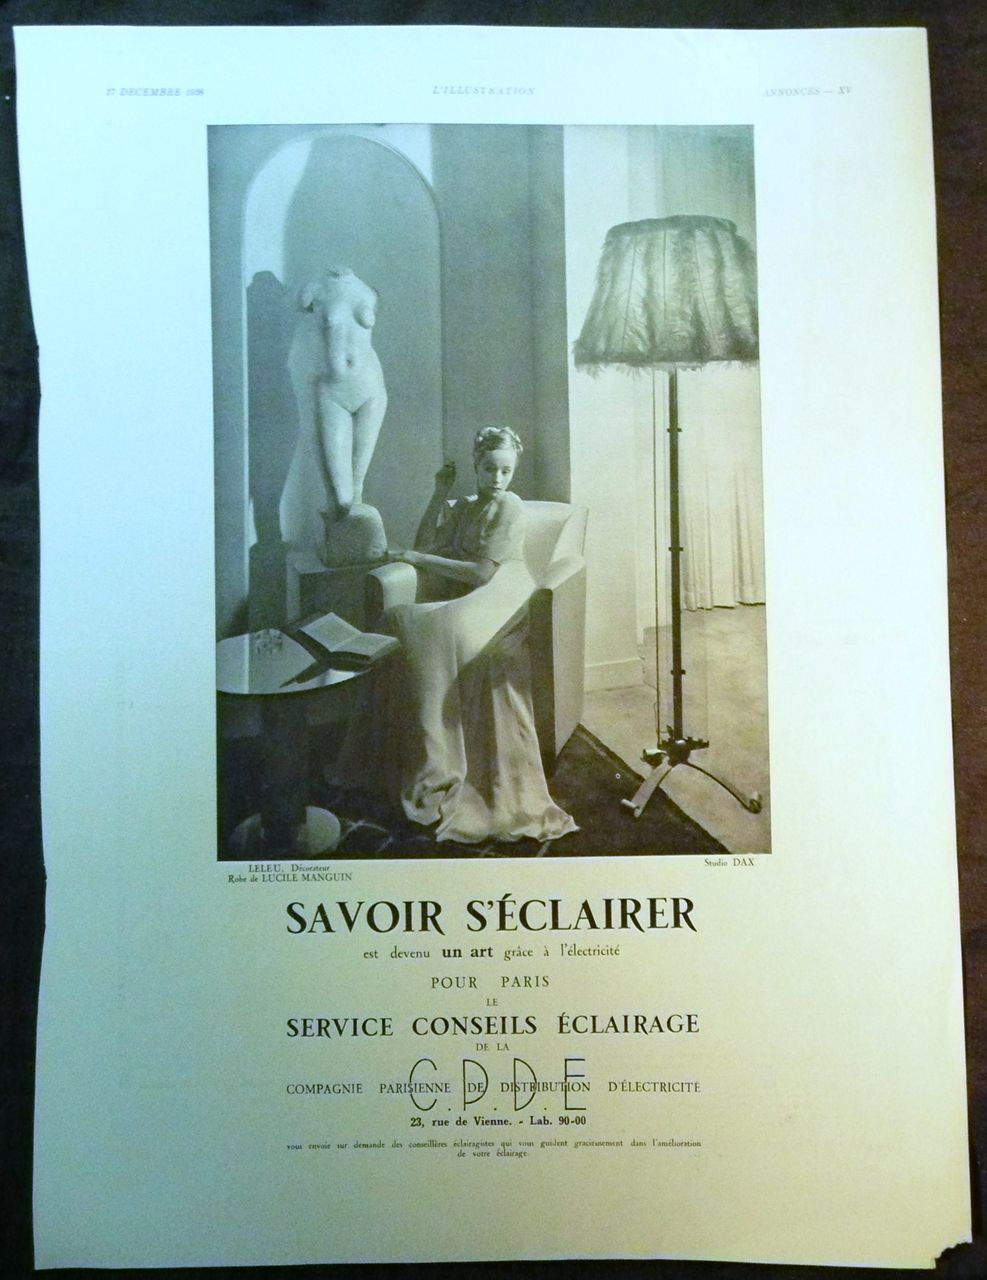 ORIGINAL Savoir SECLAIRER Advert  From L ' Illustration French Magazine December 1938